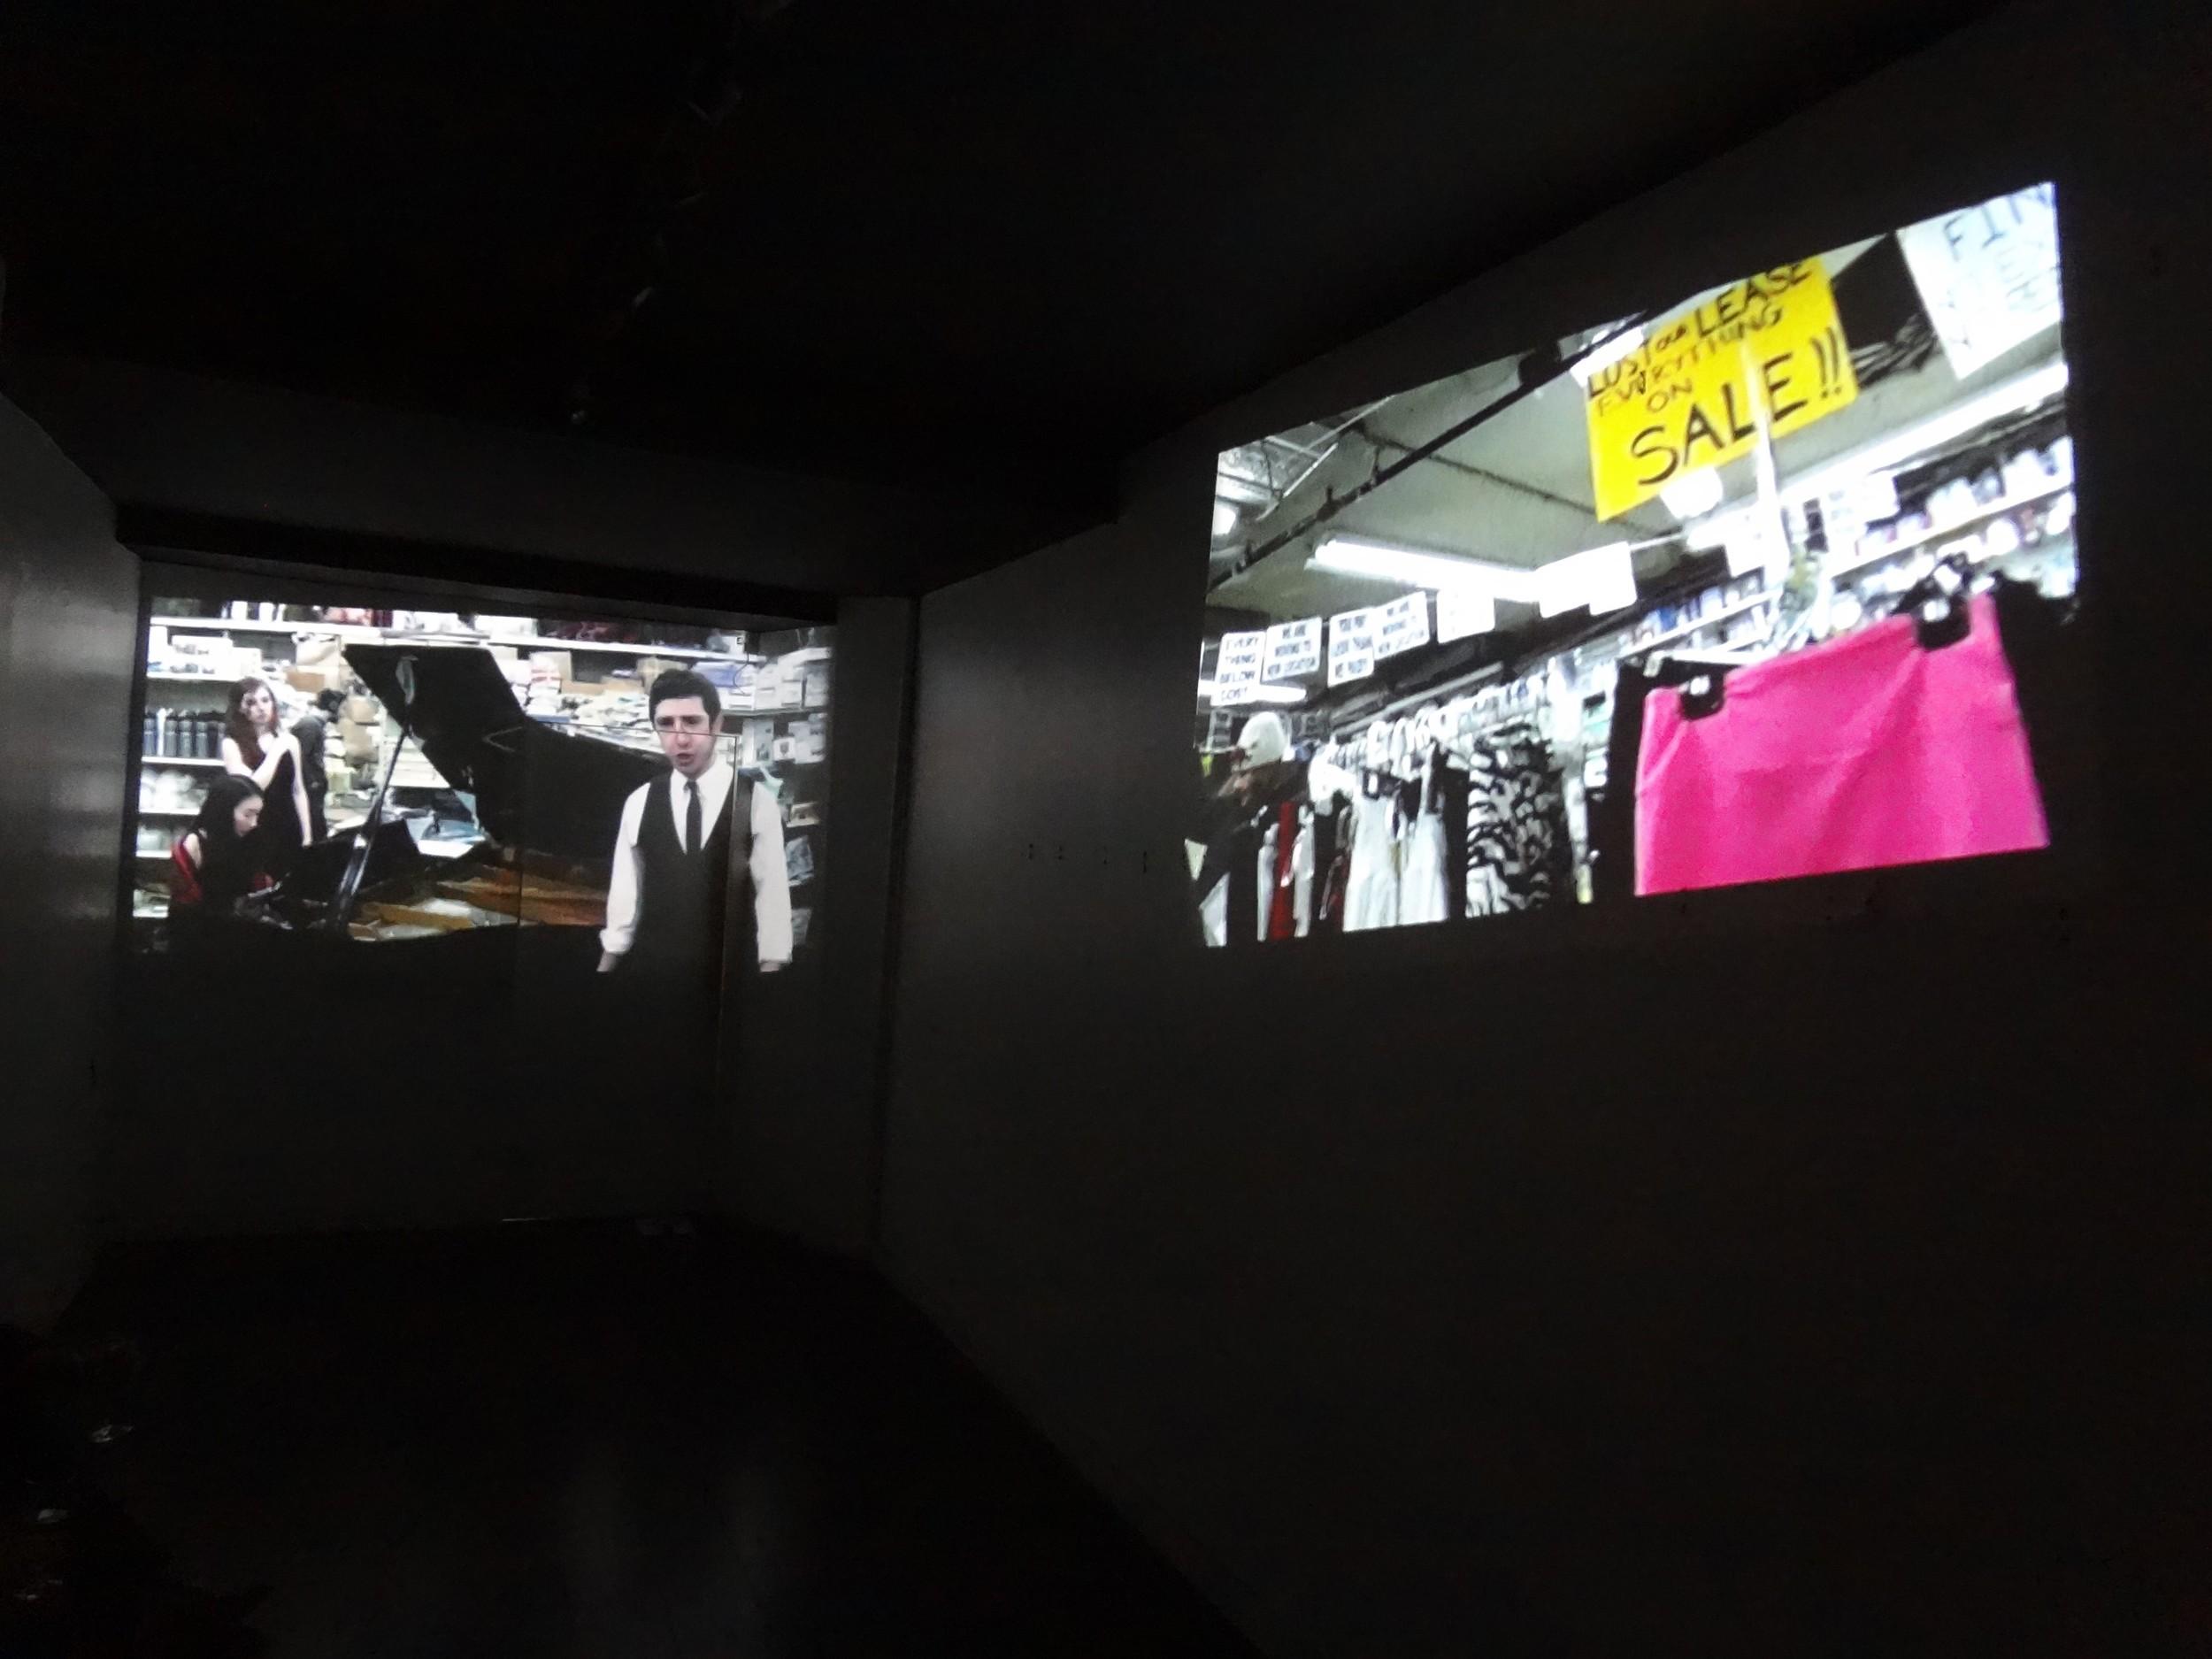 Rainer Ganahl   El Mundo (film, dual projection)  2013  55 min.  Edition 1/5